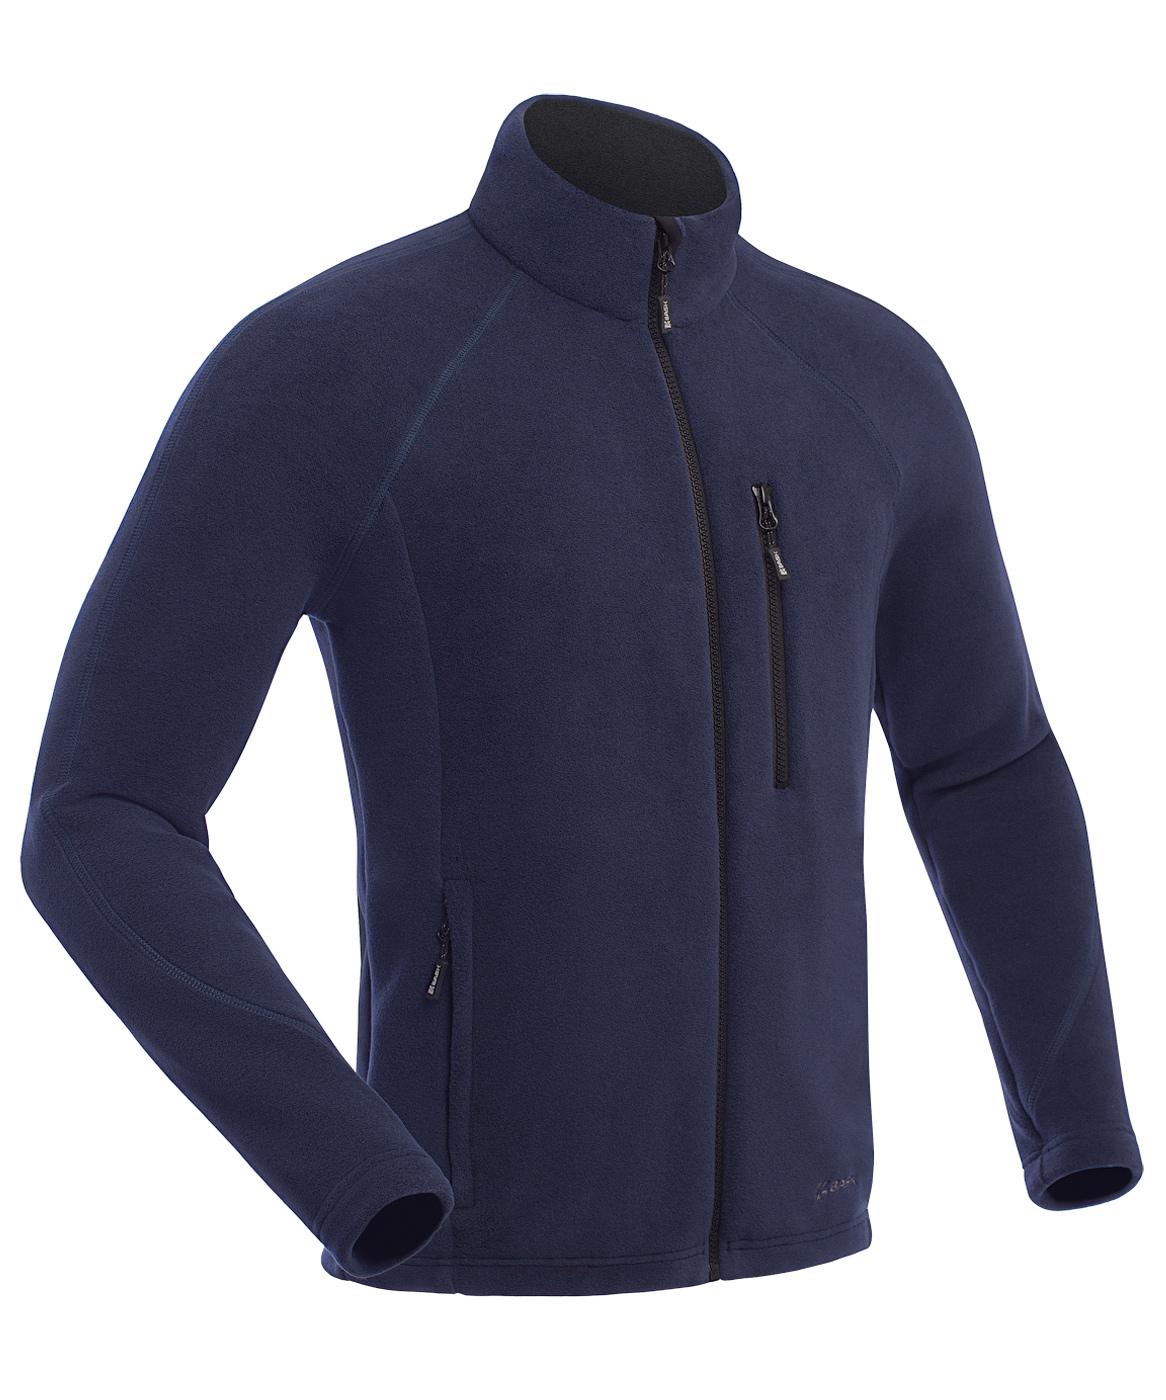 Купить Куртка Polartec BASK JUMP MJ синий тмн, Компания БАСК